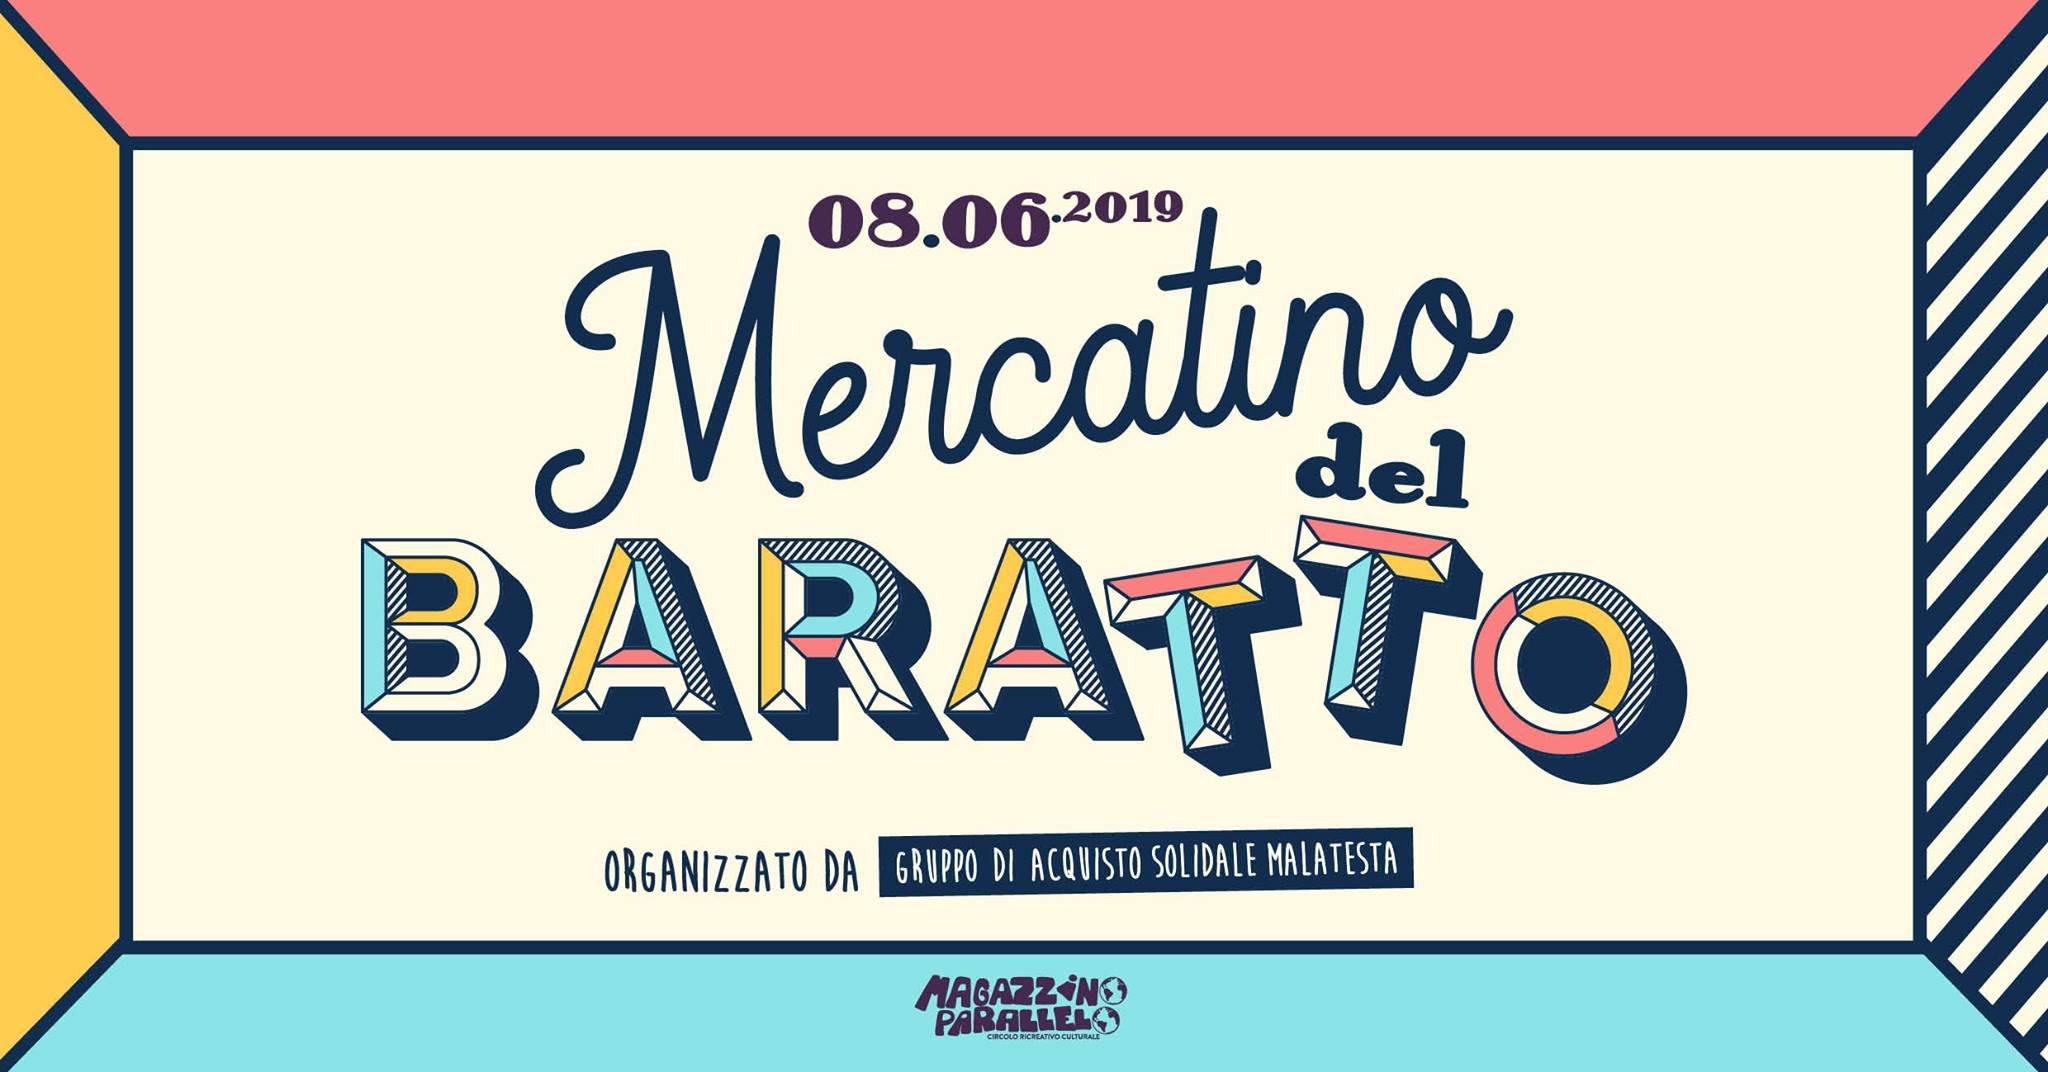 Mercatino del Baratto / at Magazzino Parallelo